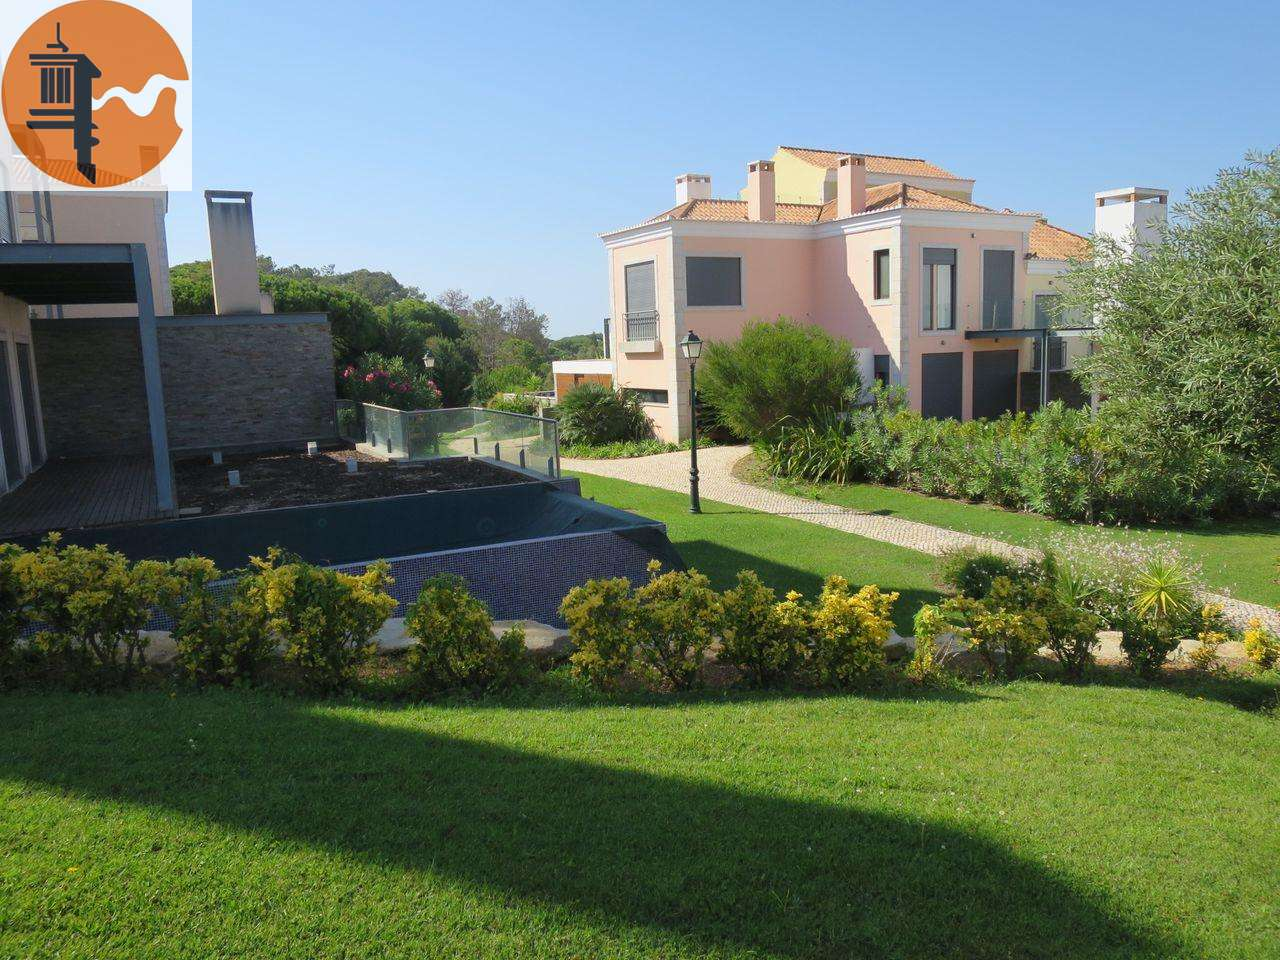 Apartamento para comprar, Almancil, Faro - Foto 11